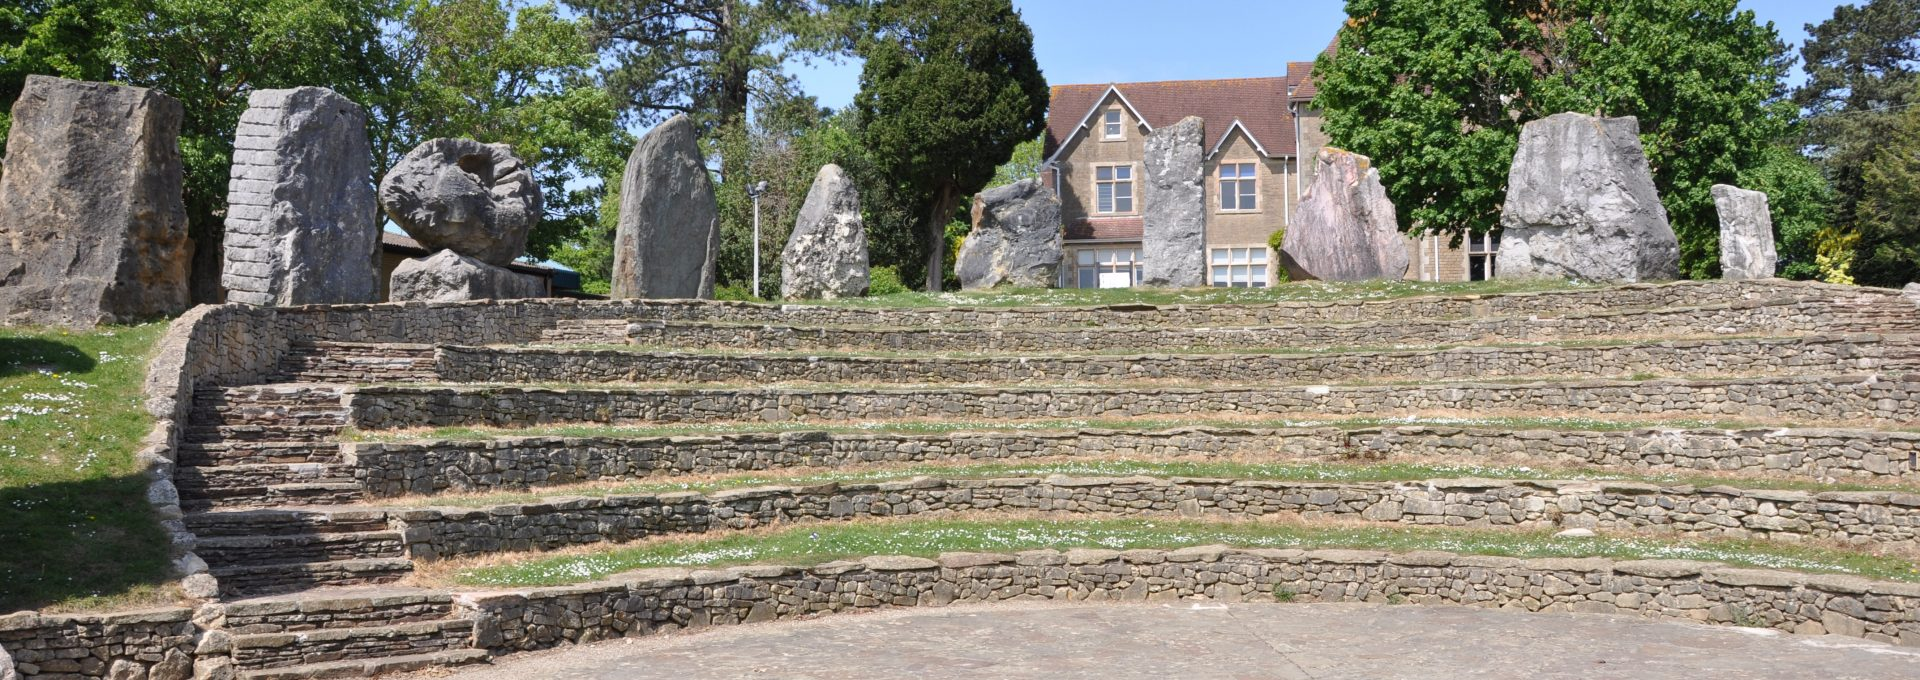 ECOS amphitheatre, Frome